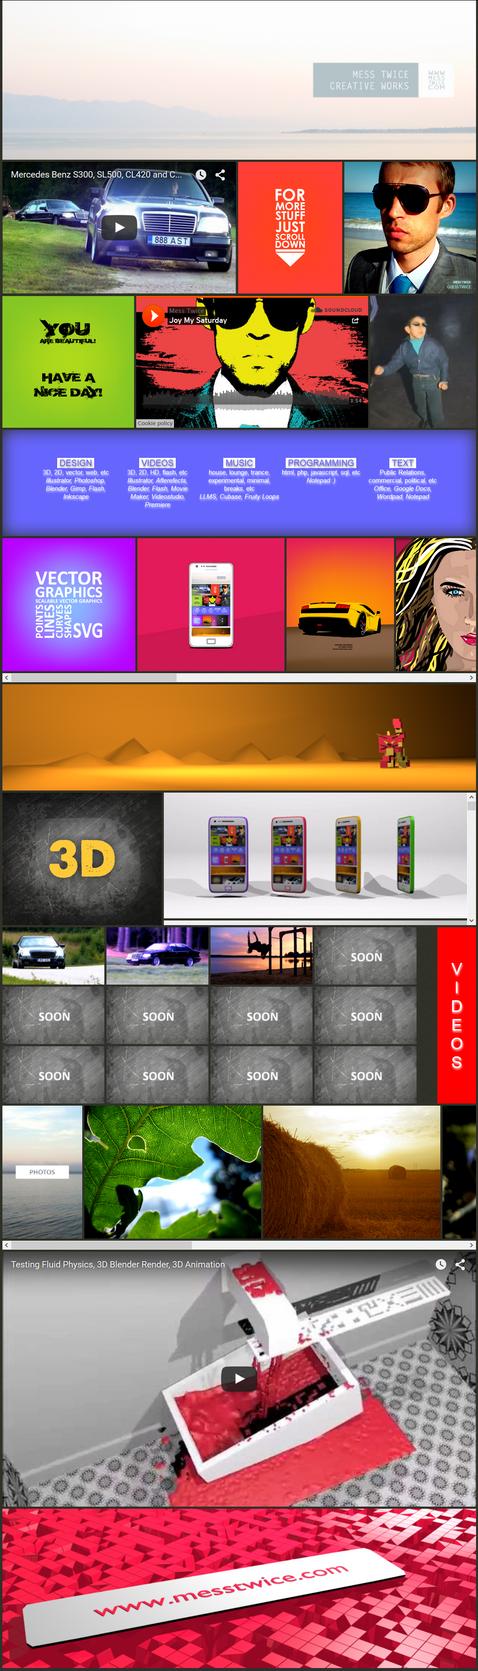 Webdesign work in progress - screenshot by messtwice